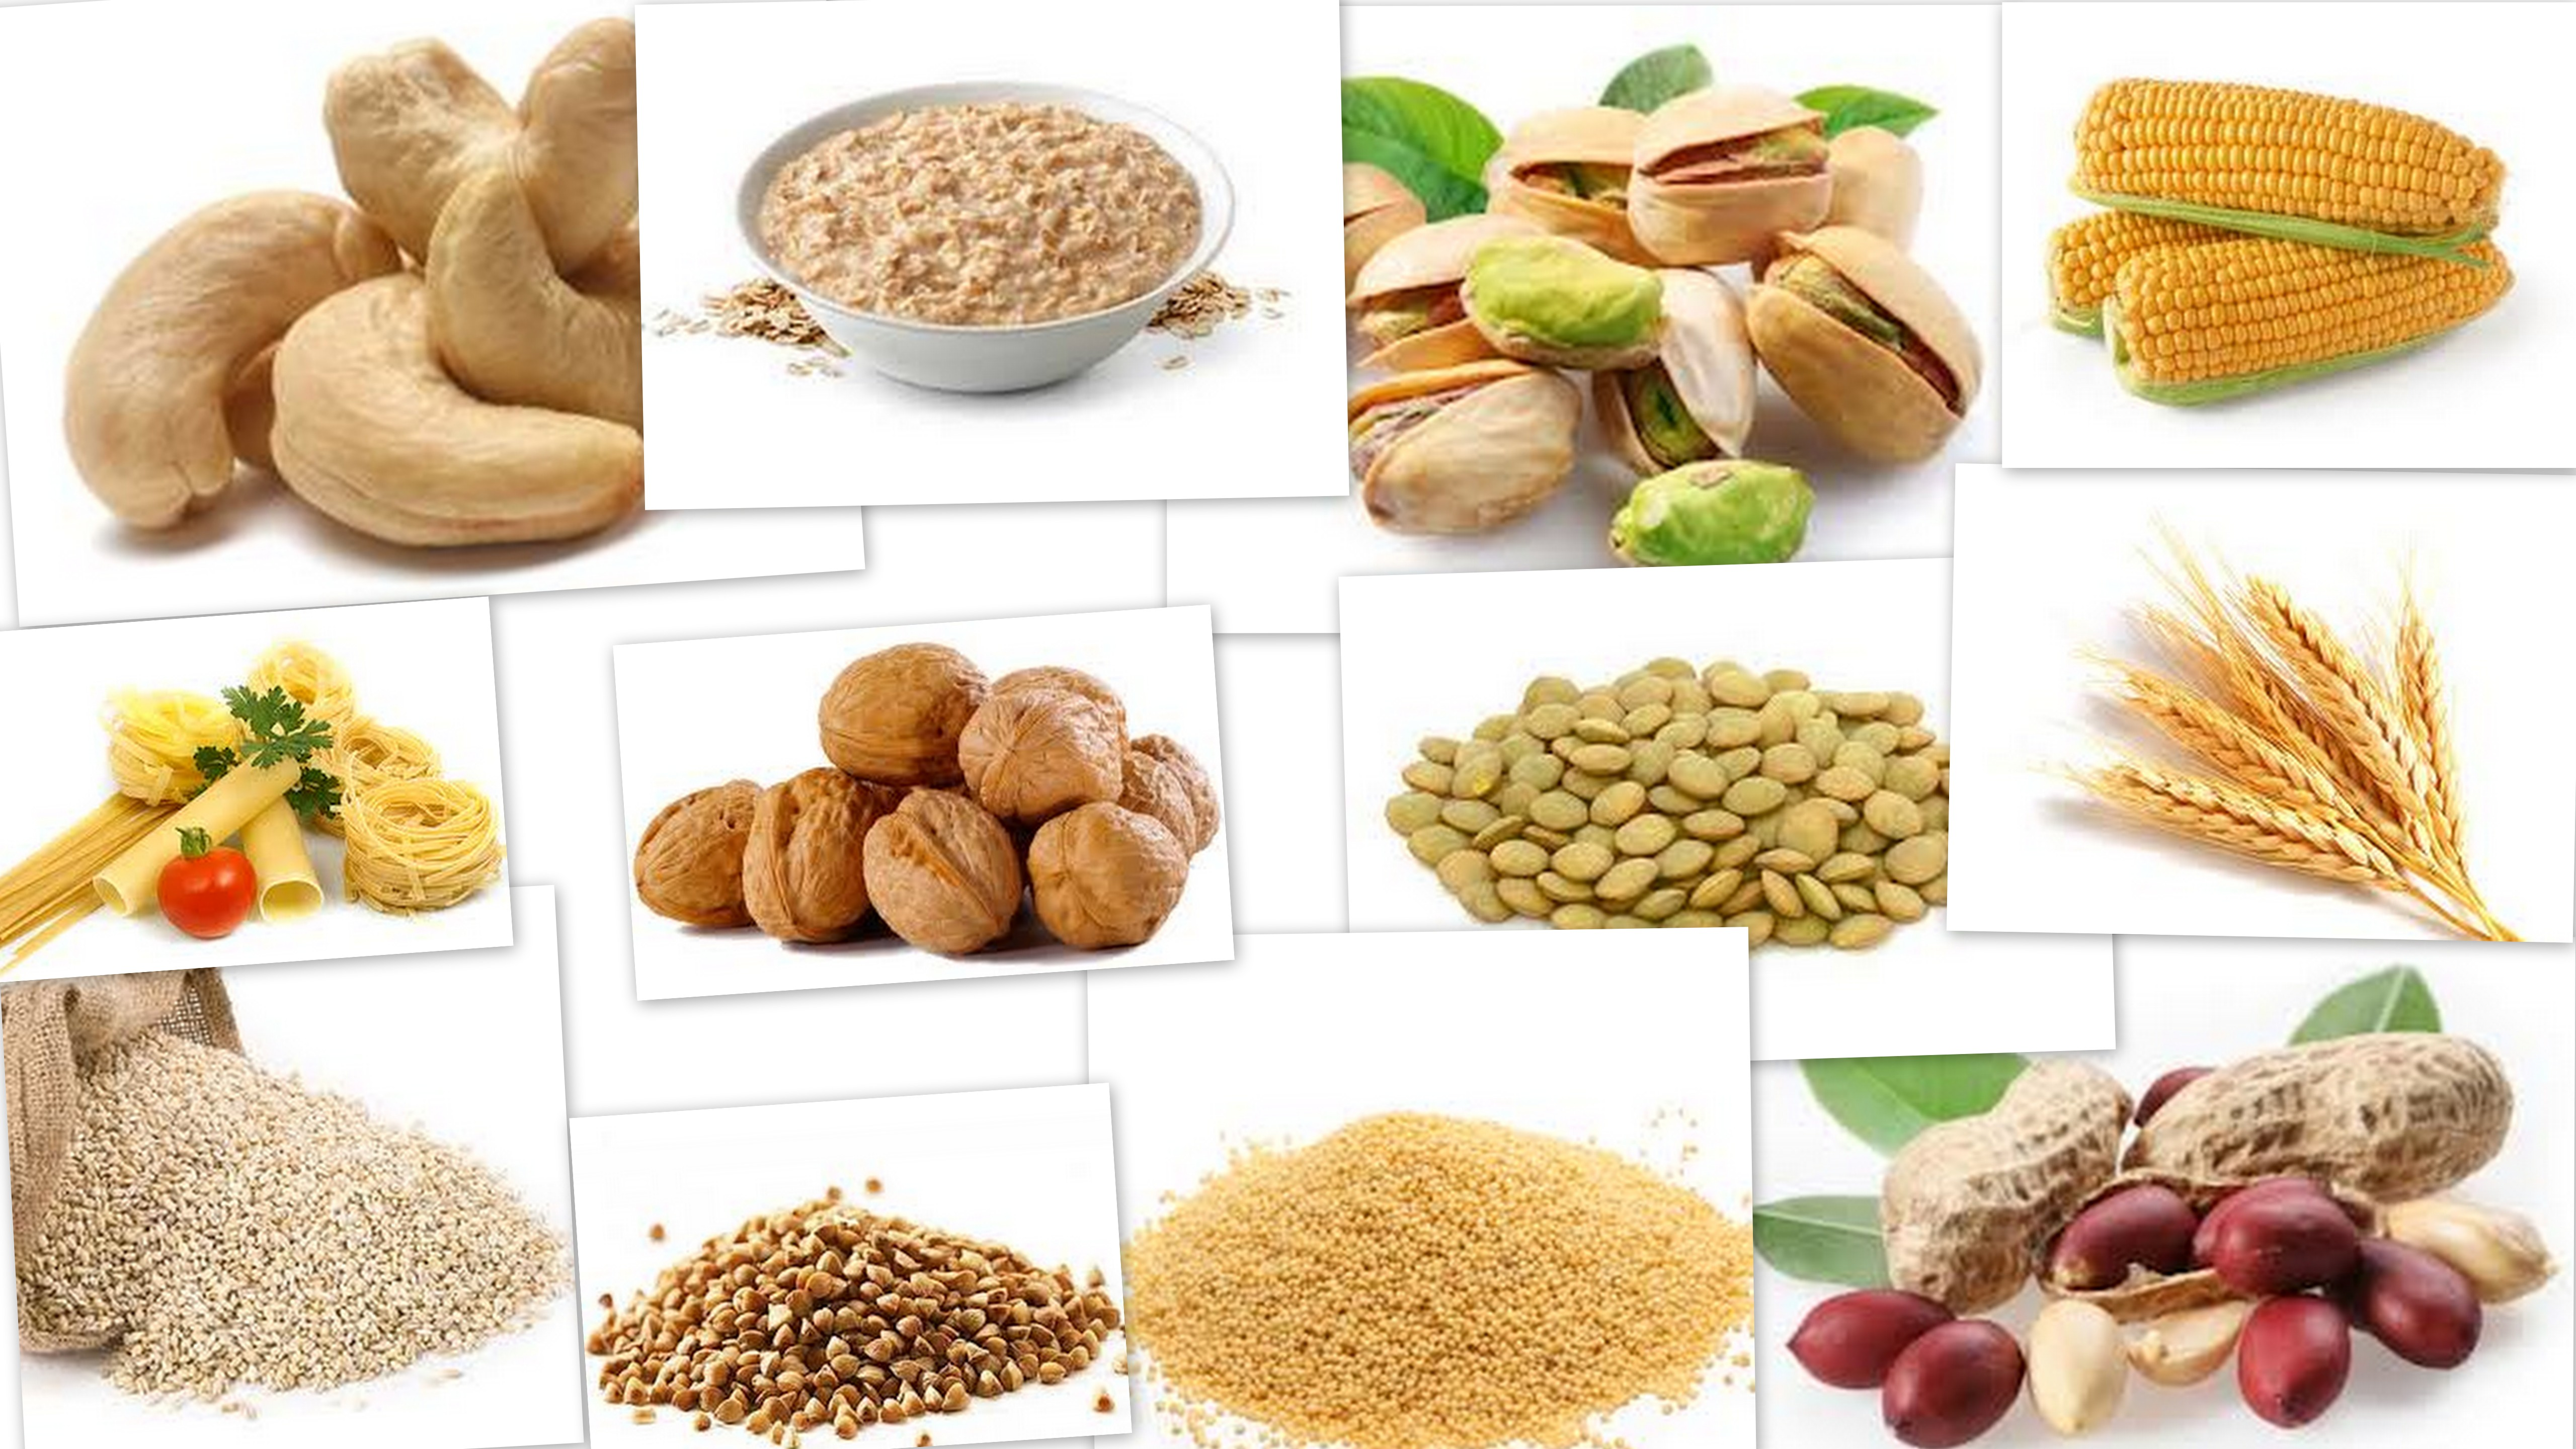 витамин б для стимуляции овуляции